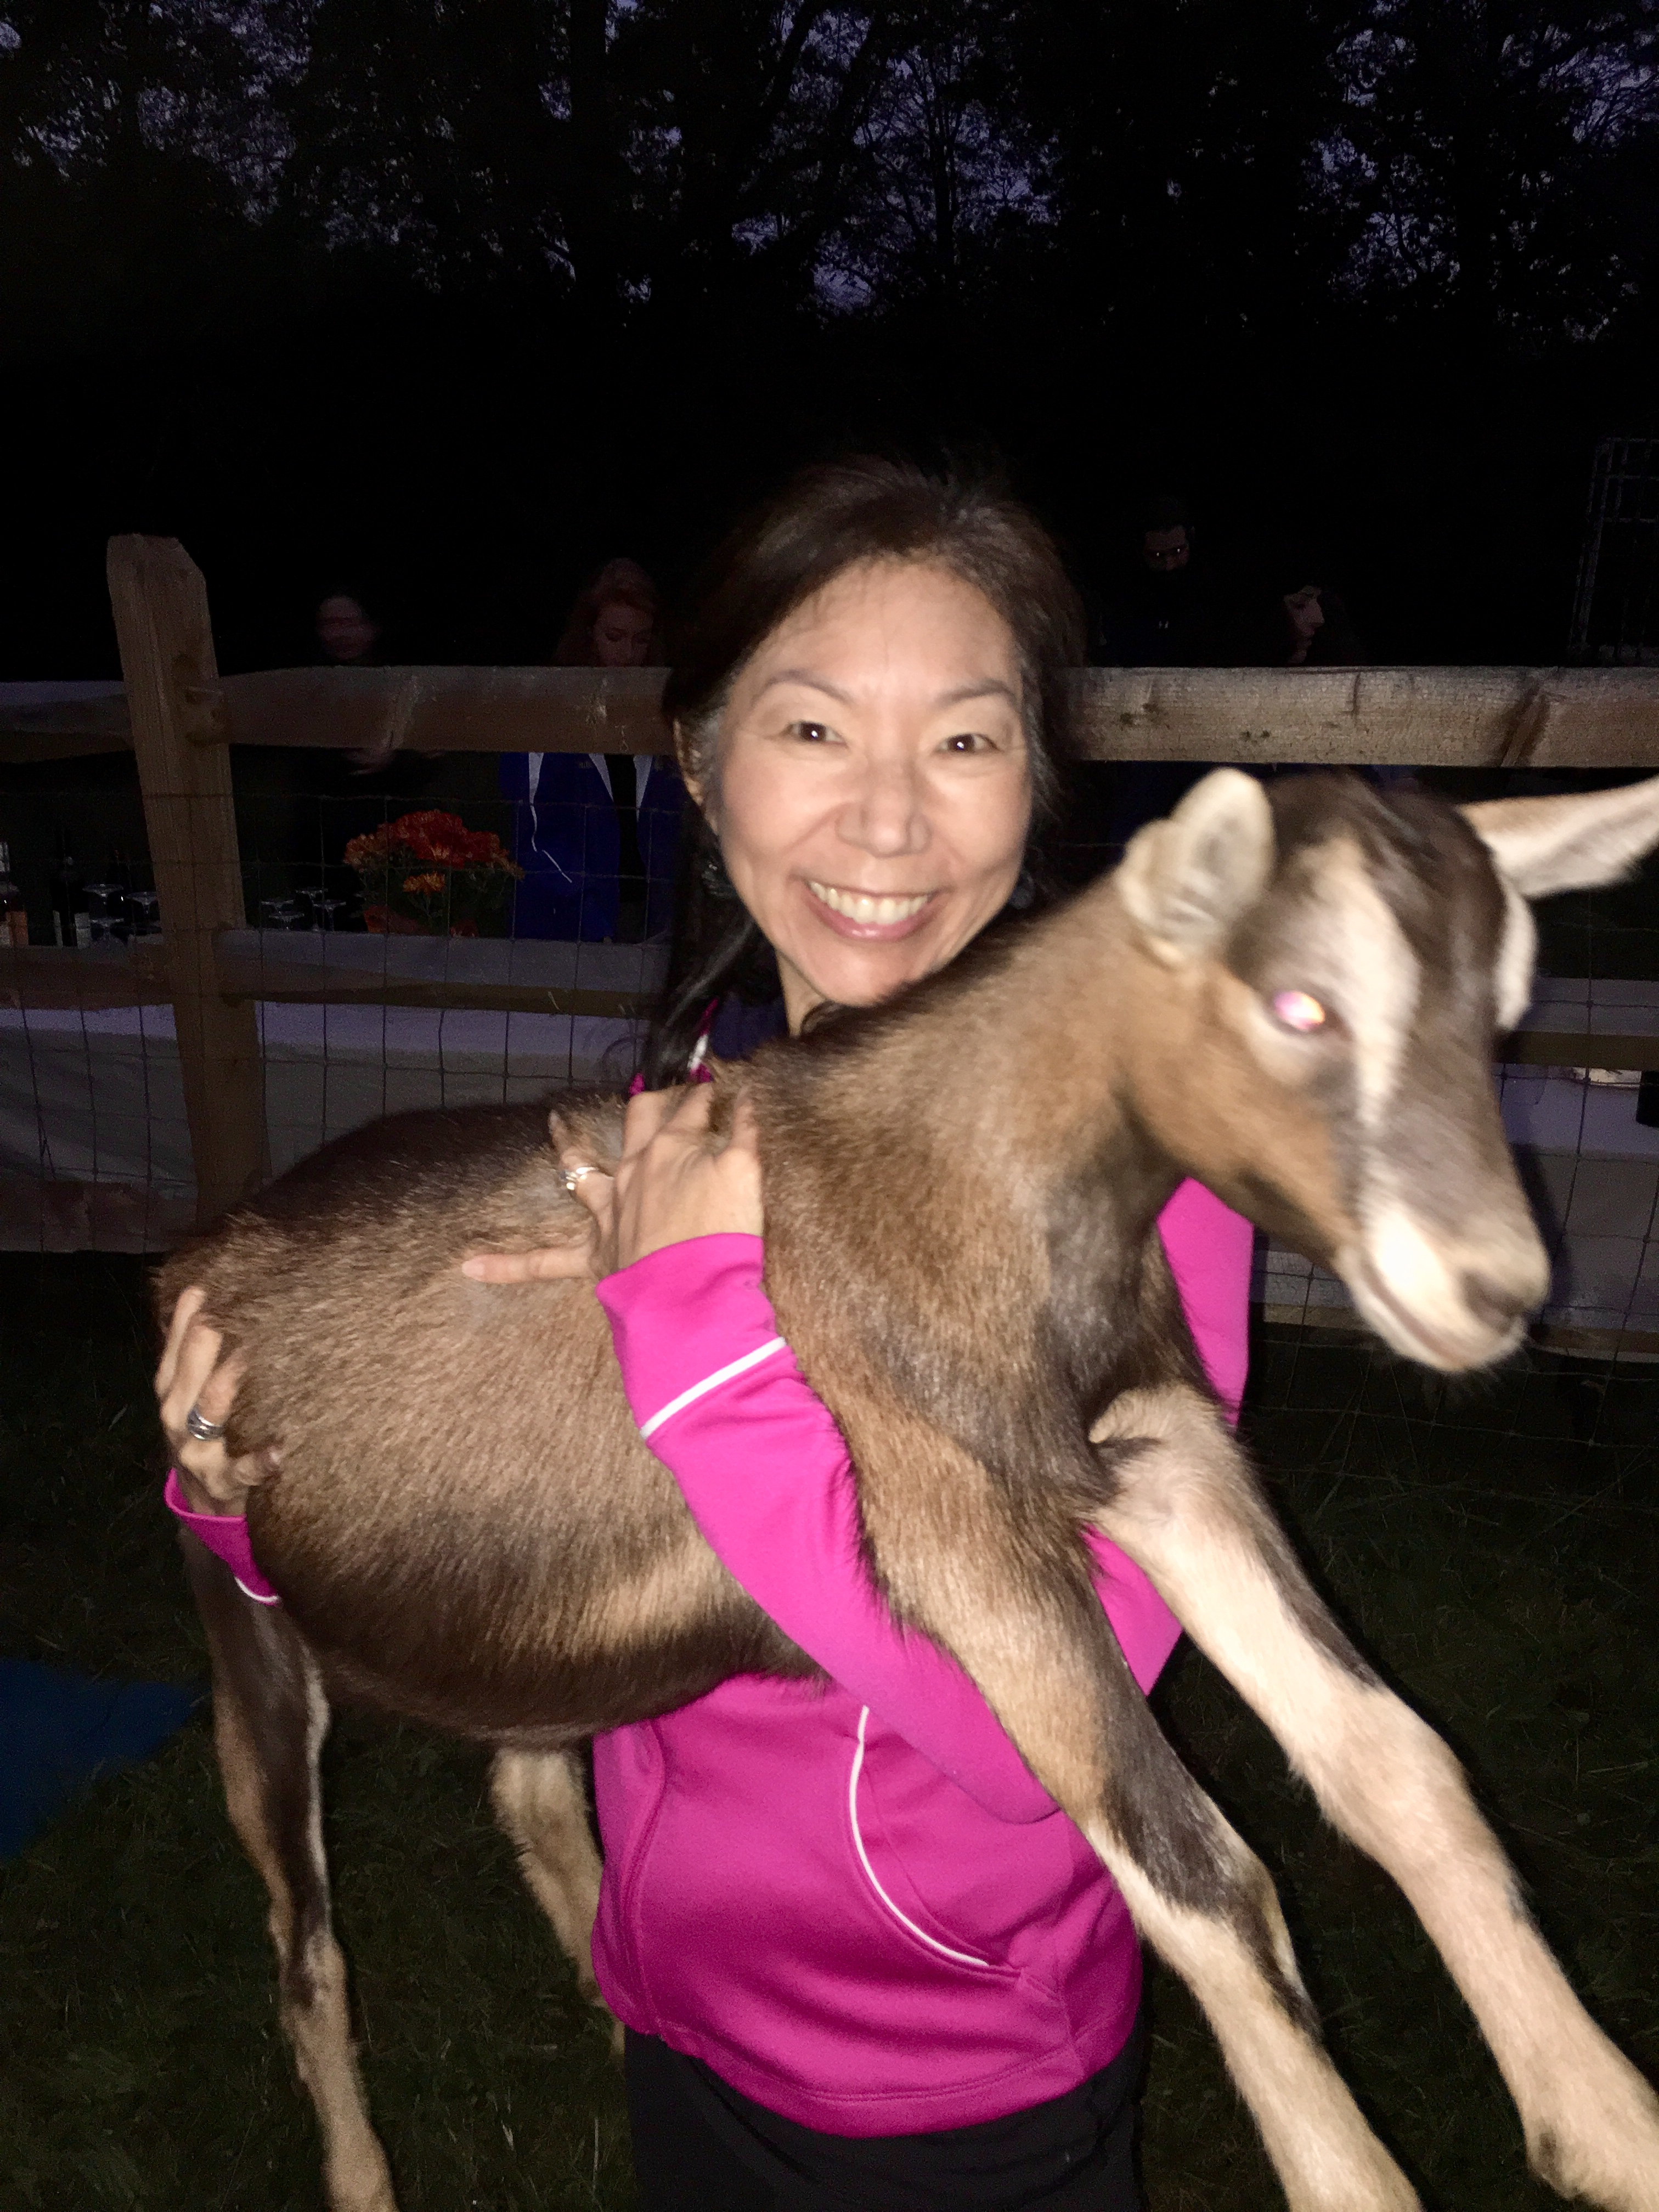 My goat yoga partner